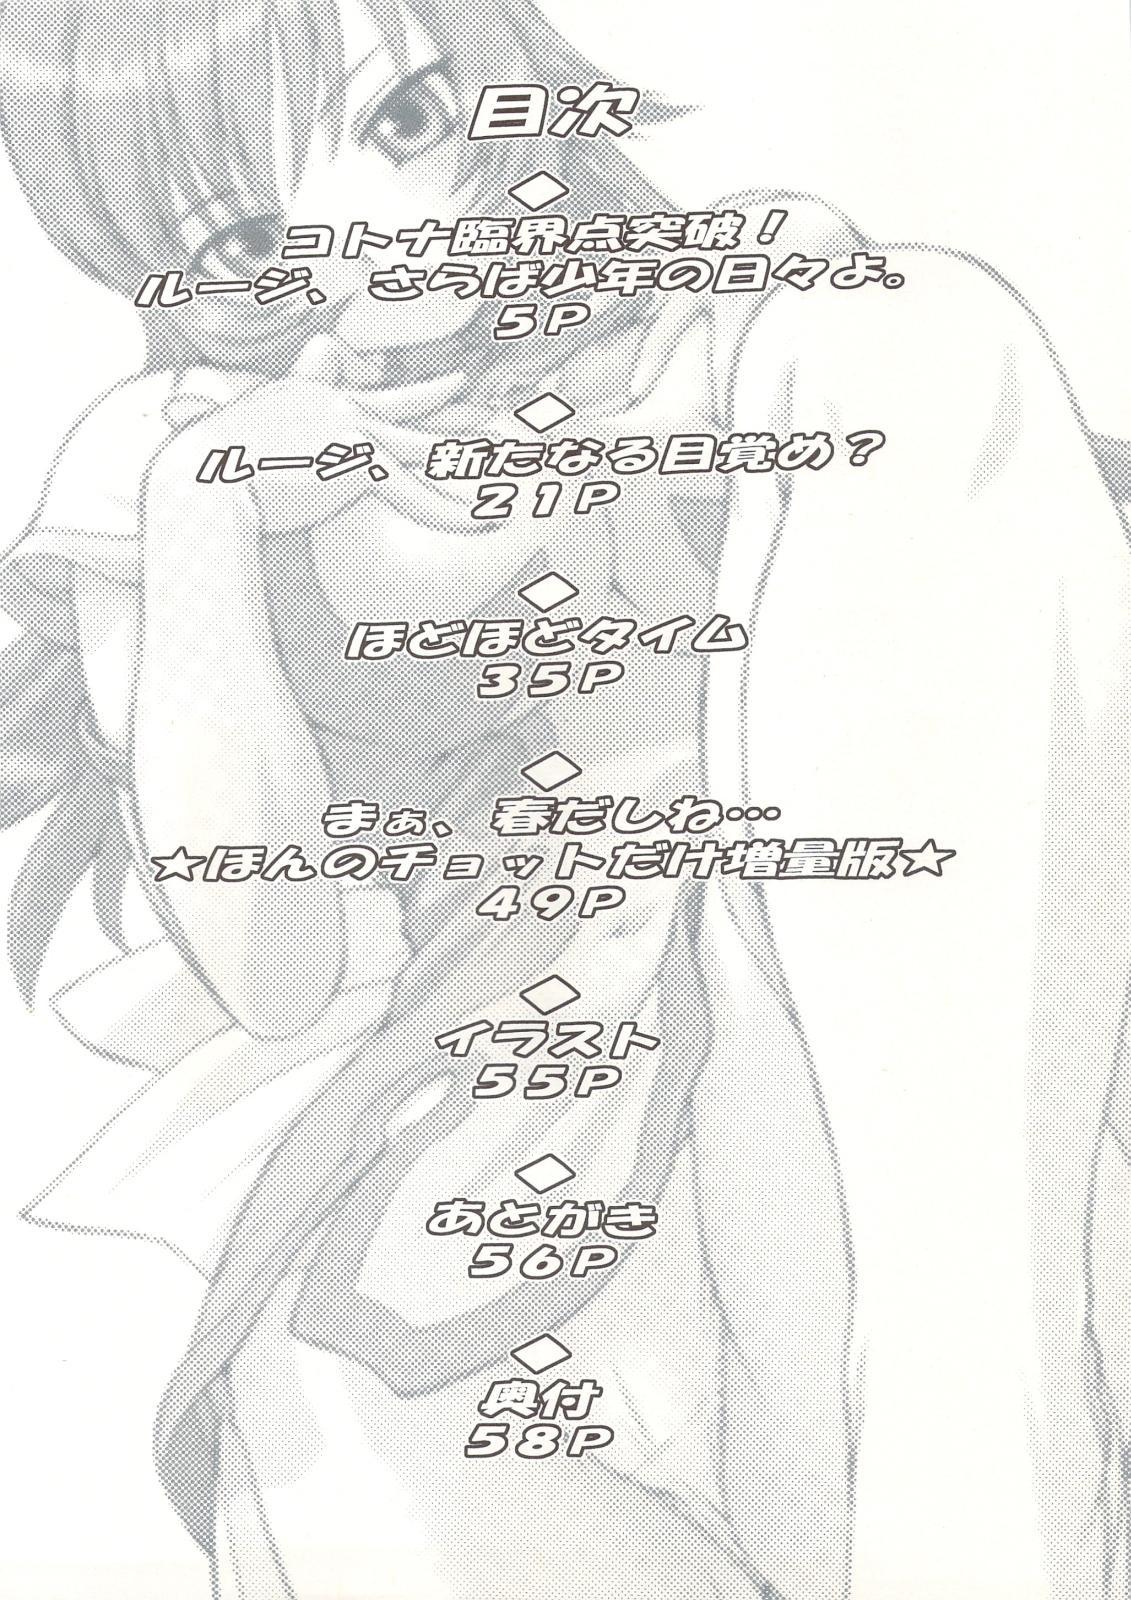 Anemono Hitomatome Plus Soushuuhen 3 2